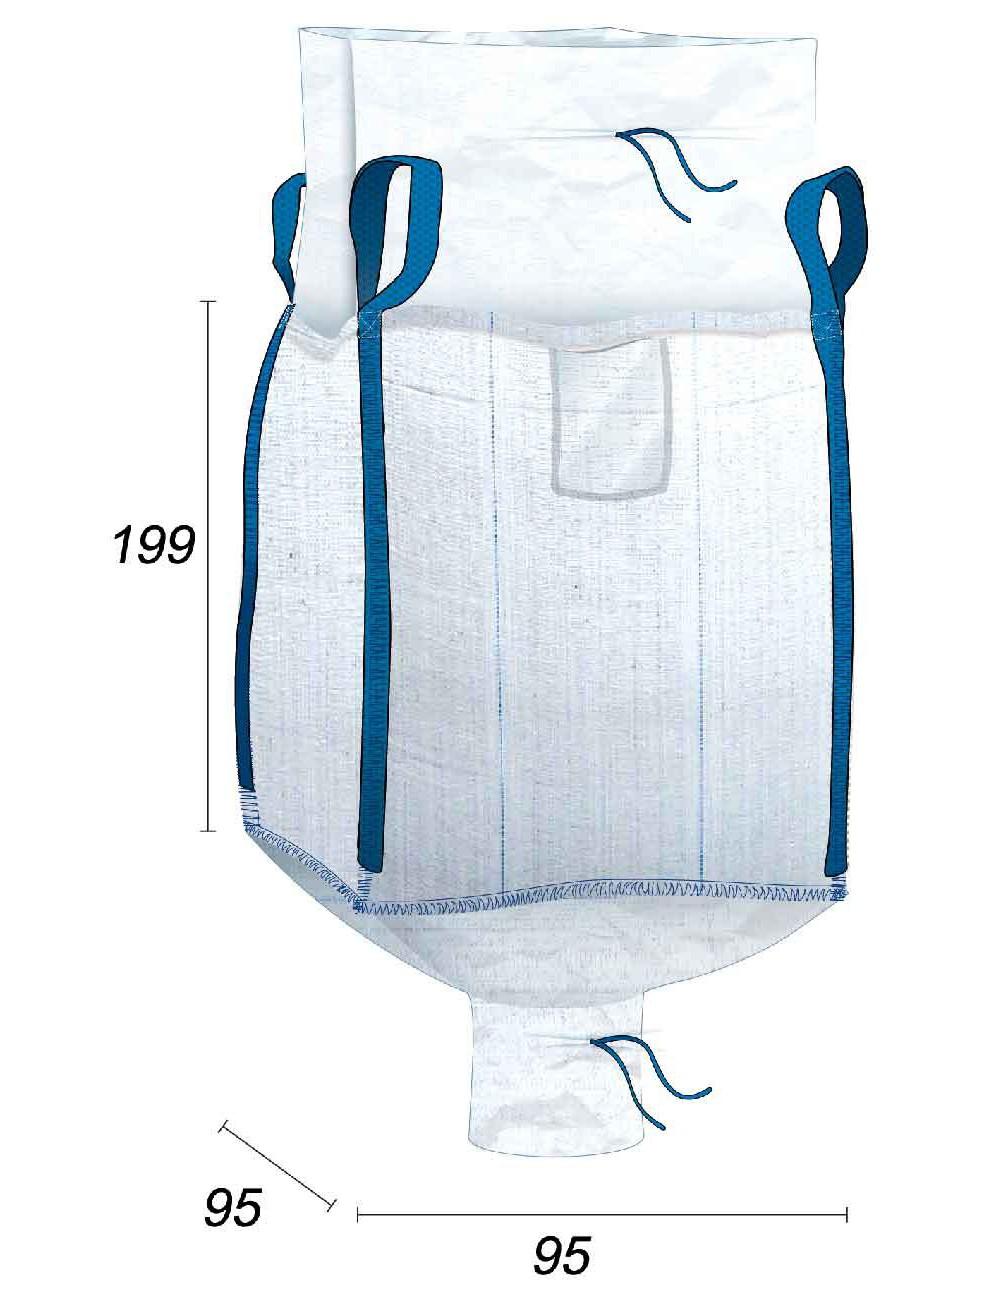 Big Bag Granos de girasol, soja, cebada - 95X95X199